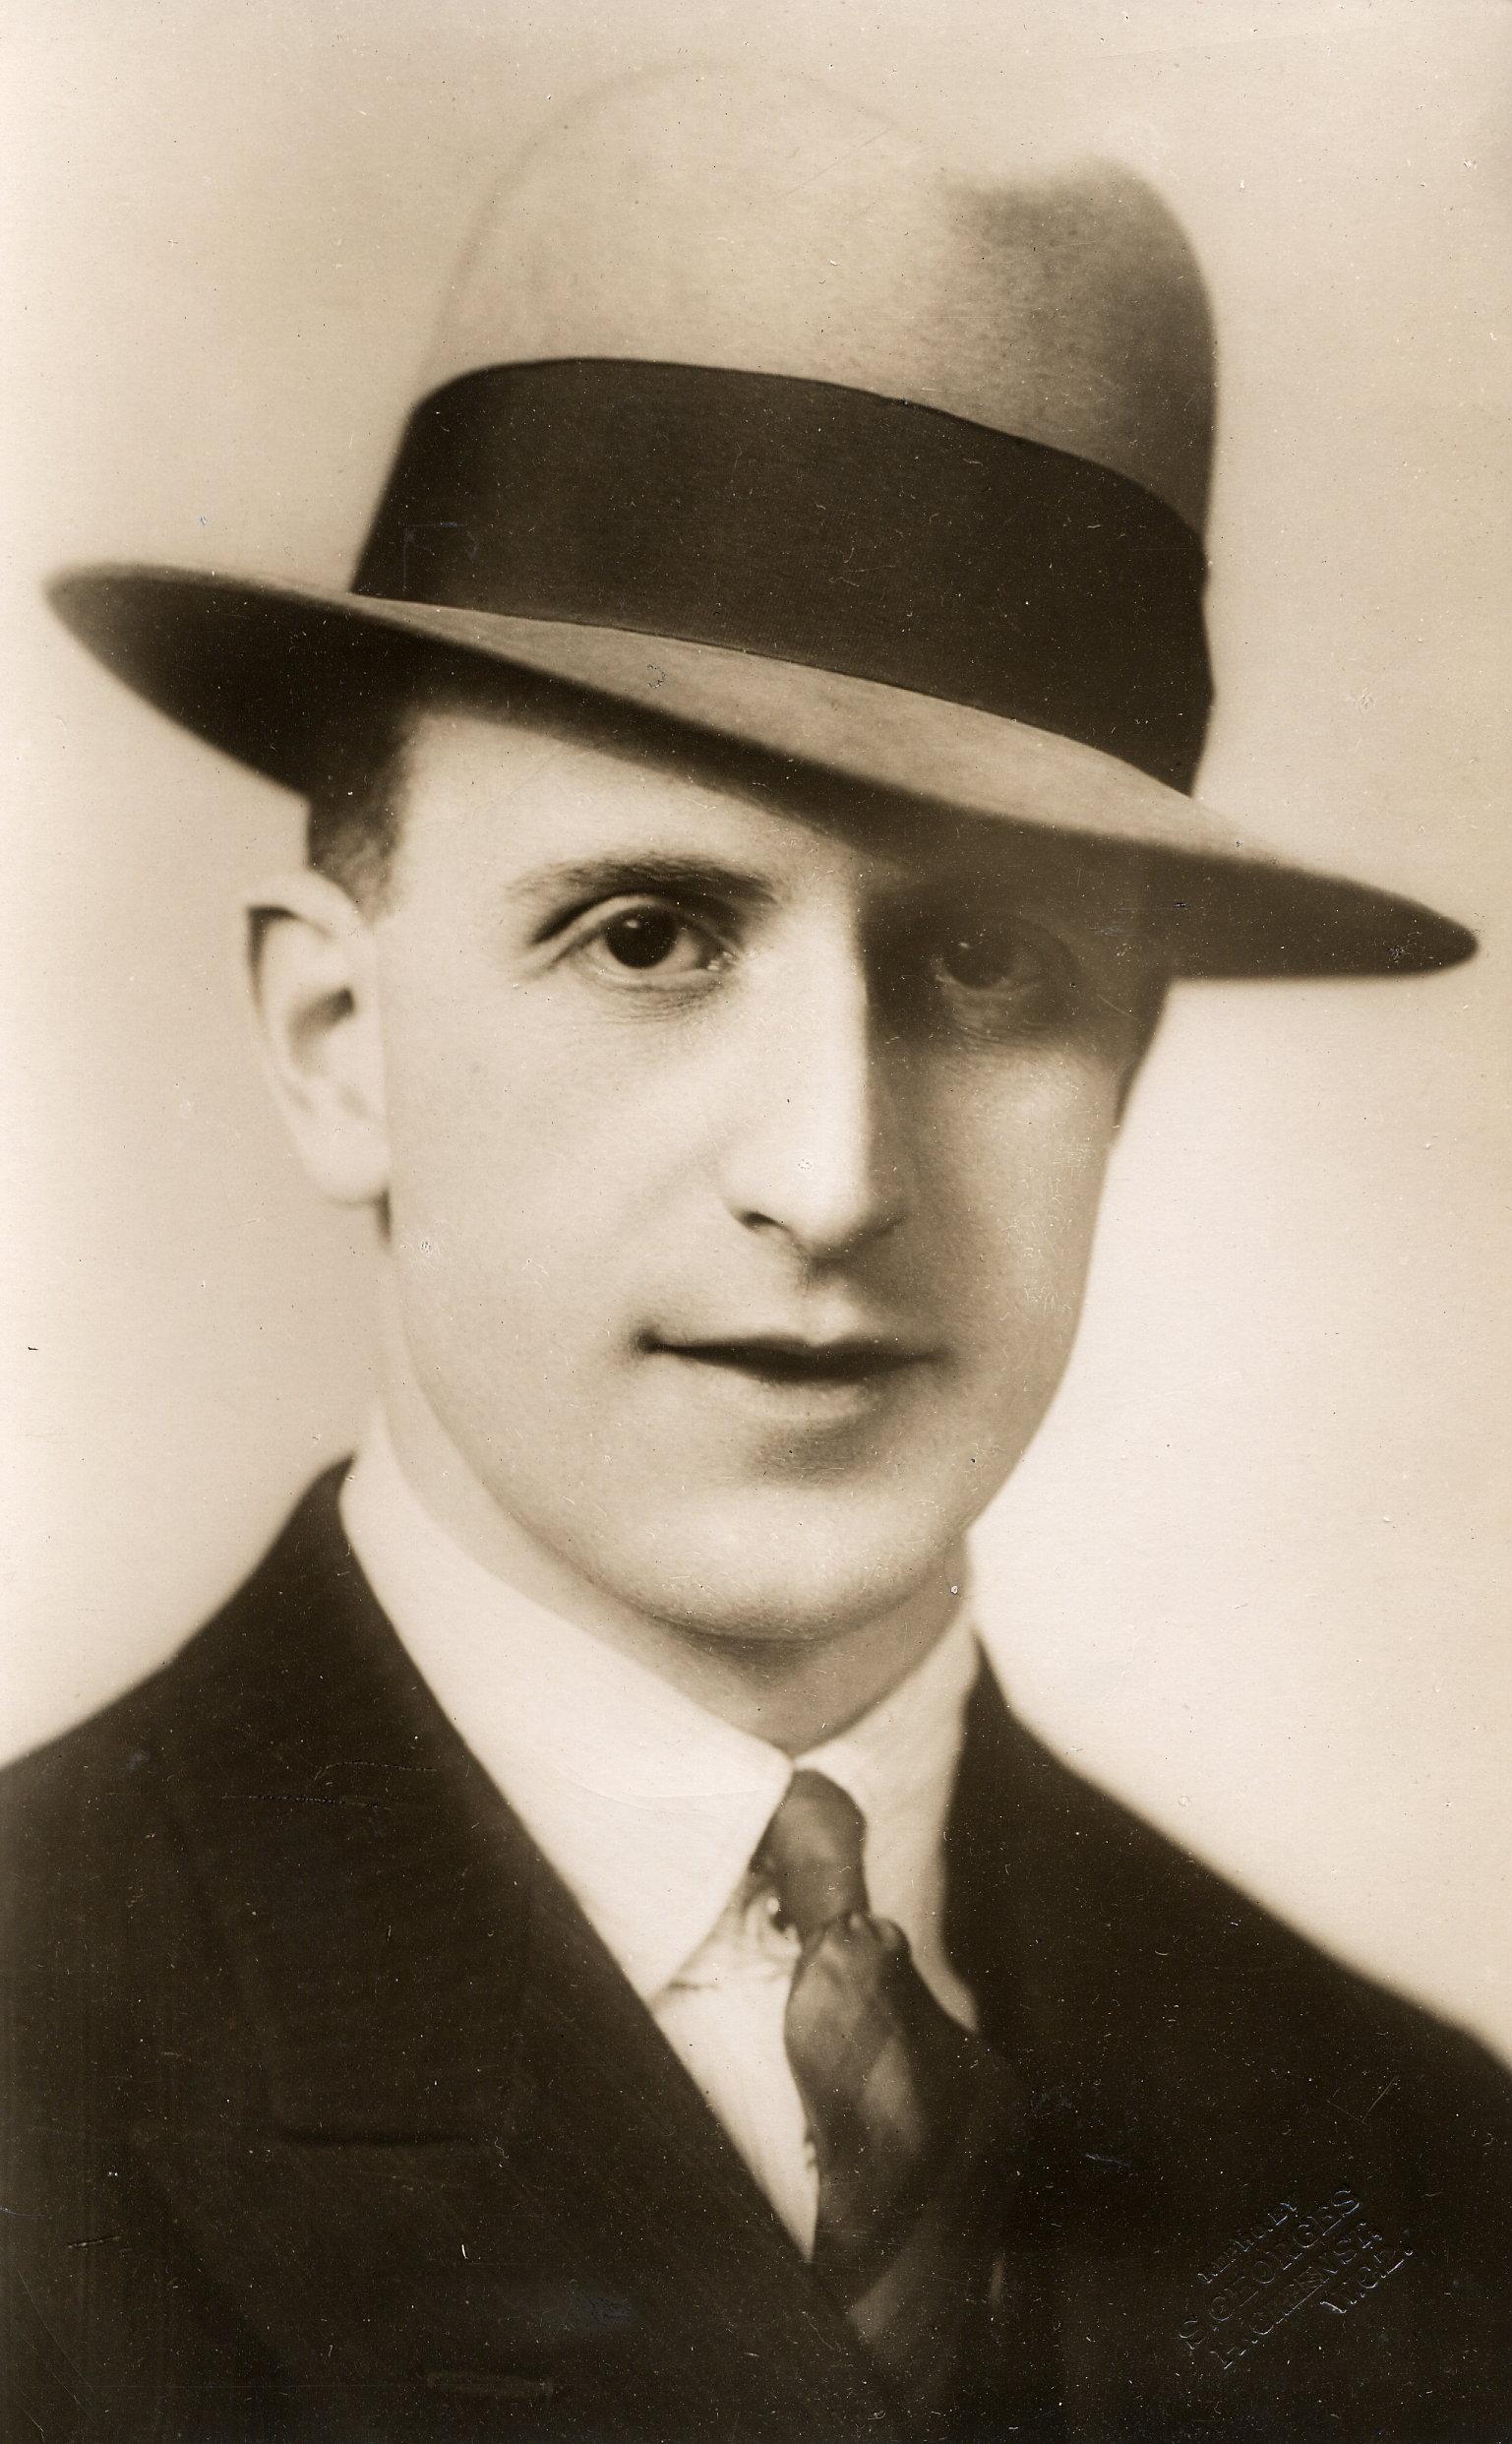 Harry Shalson